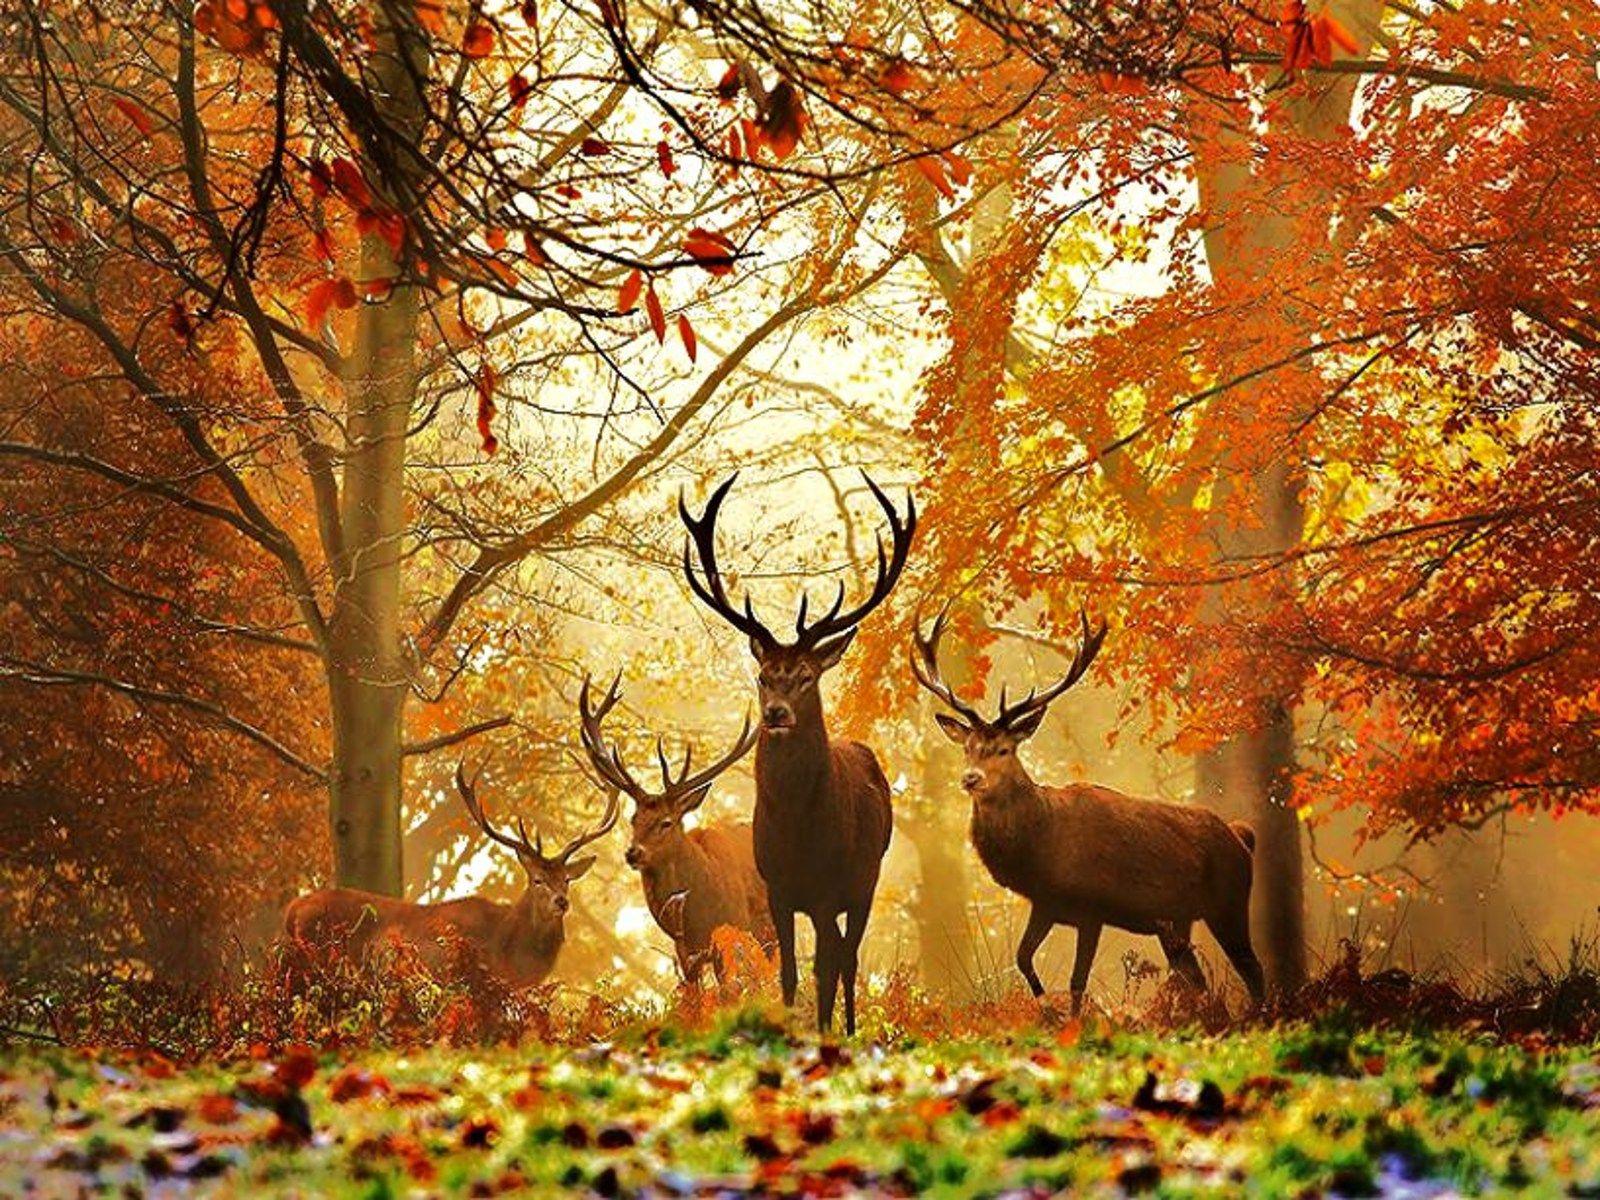 Amazing Deer Wallpaper Hd For Desktop - Beautiful Scenery With Animals - HD Wallpaper